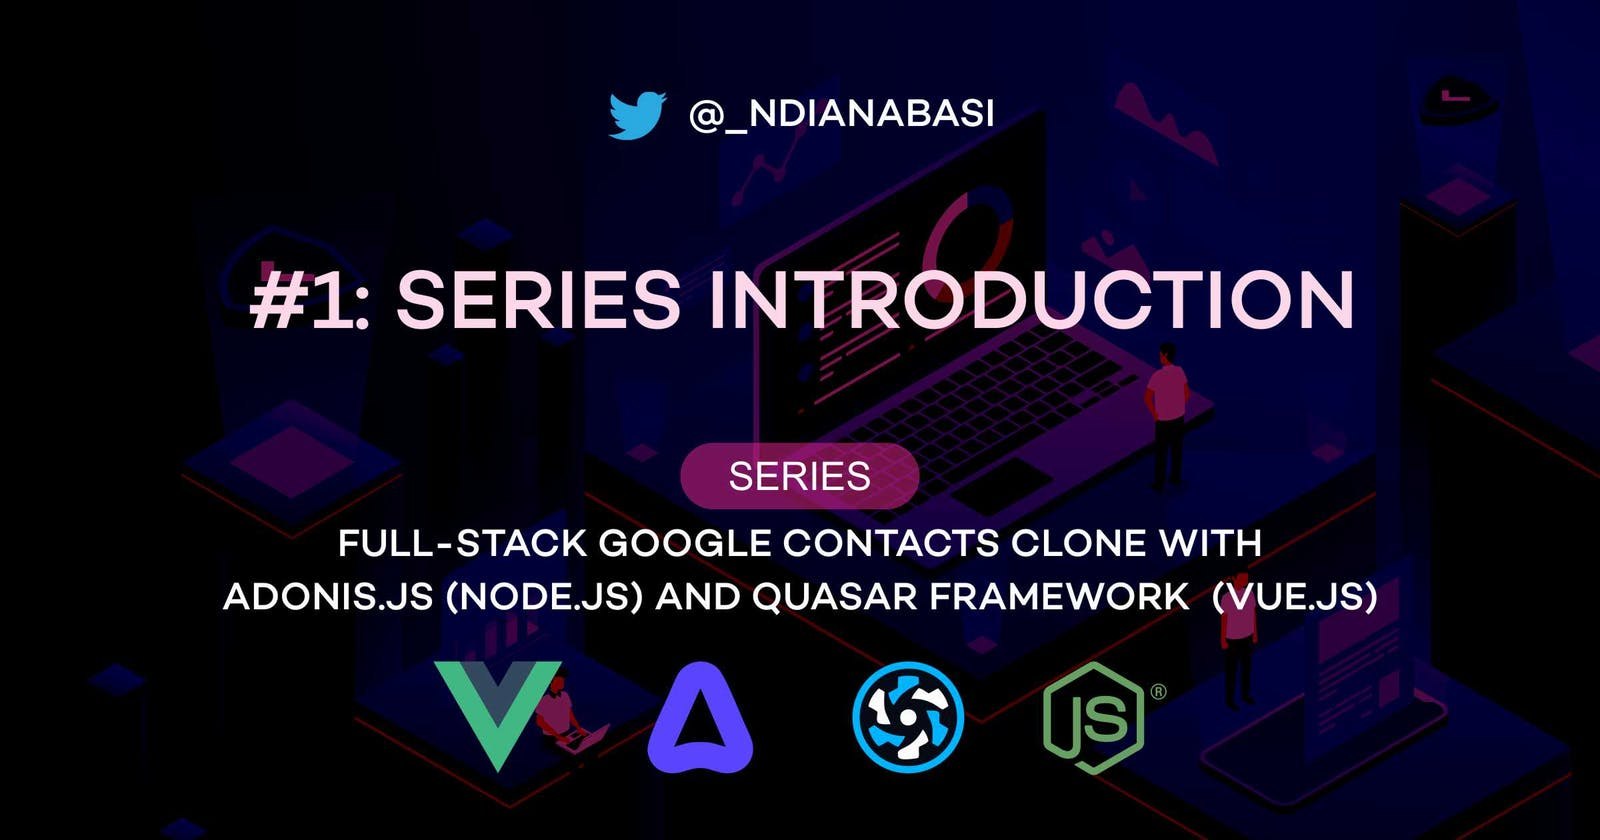 Introduction | Full-Stack Google Contacts Clone with Adonis.js/Node.js and Quasar (Vue.js)